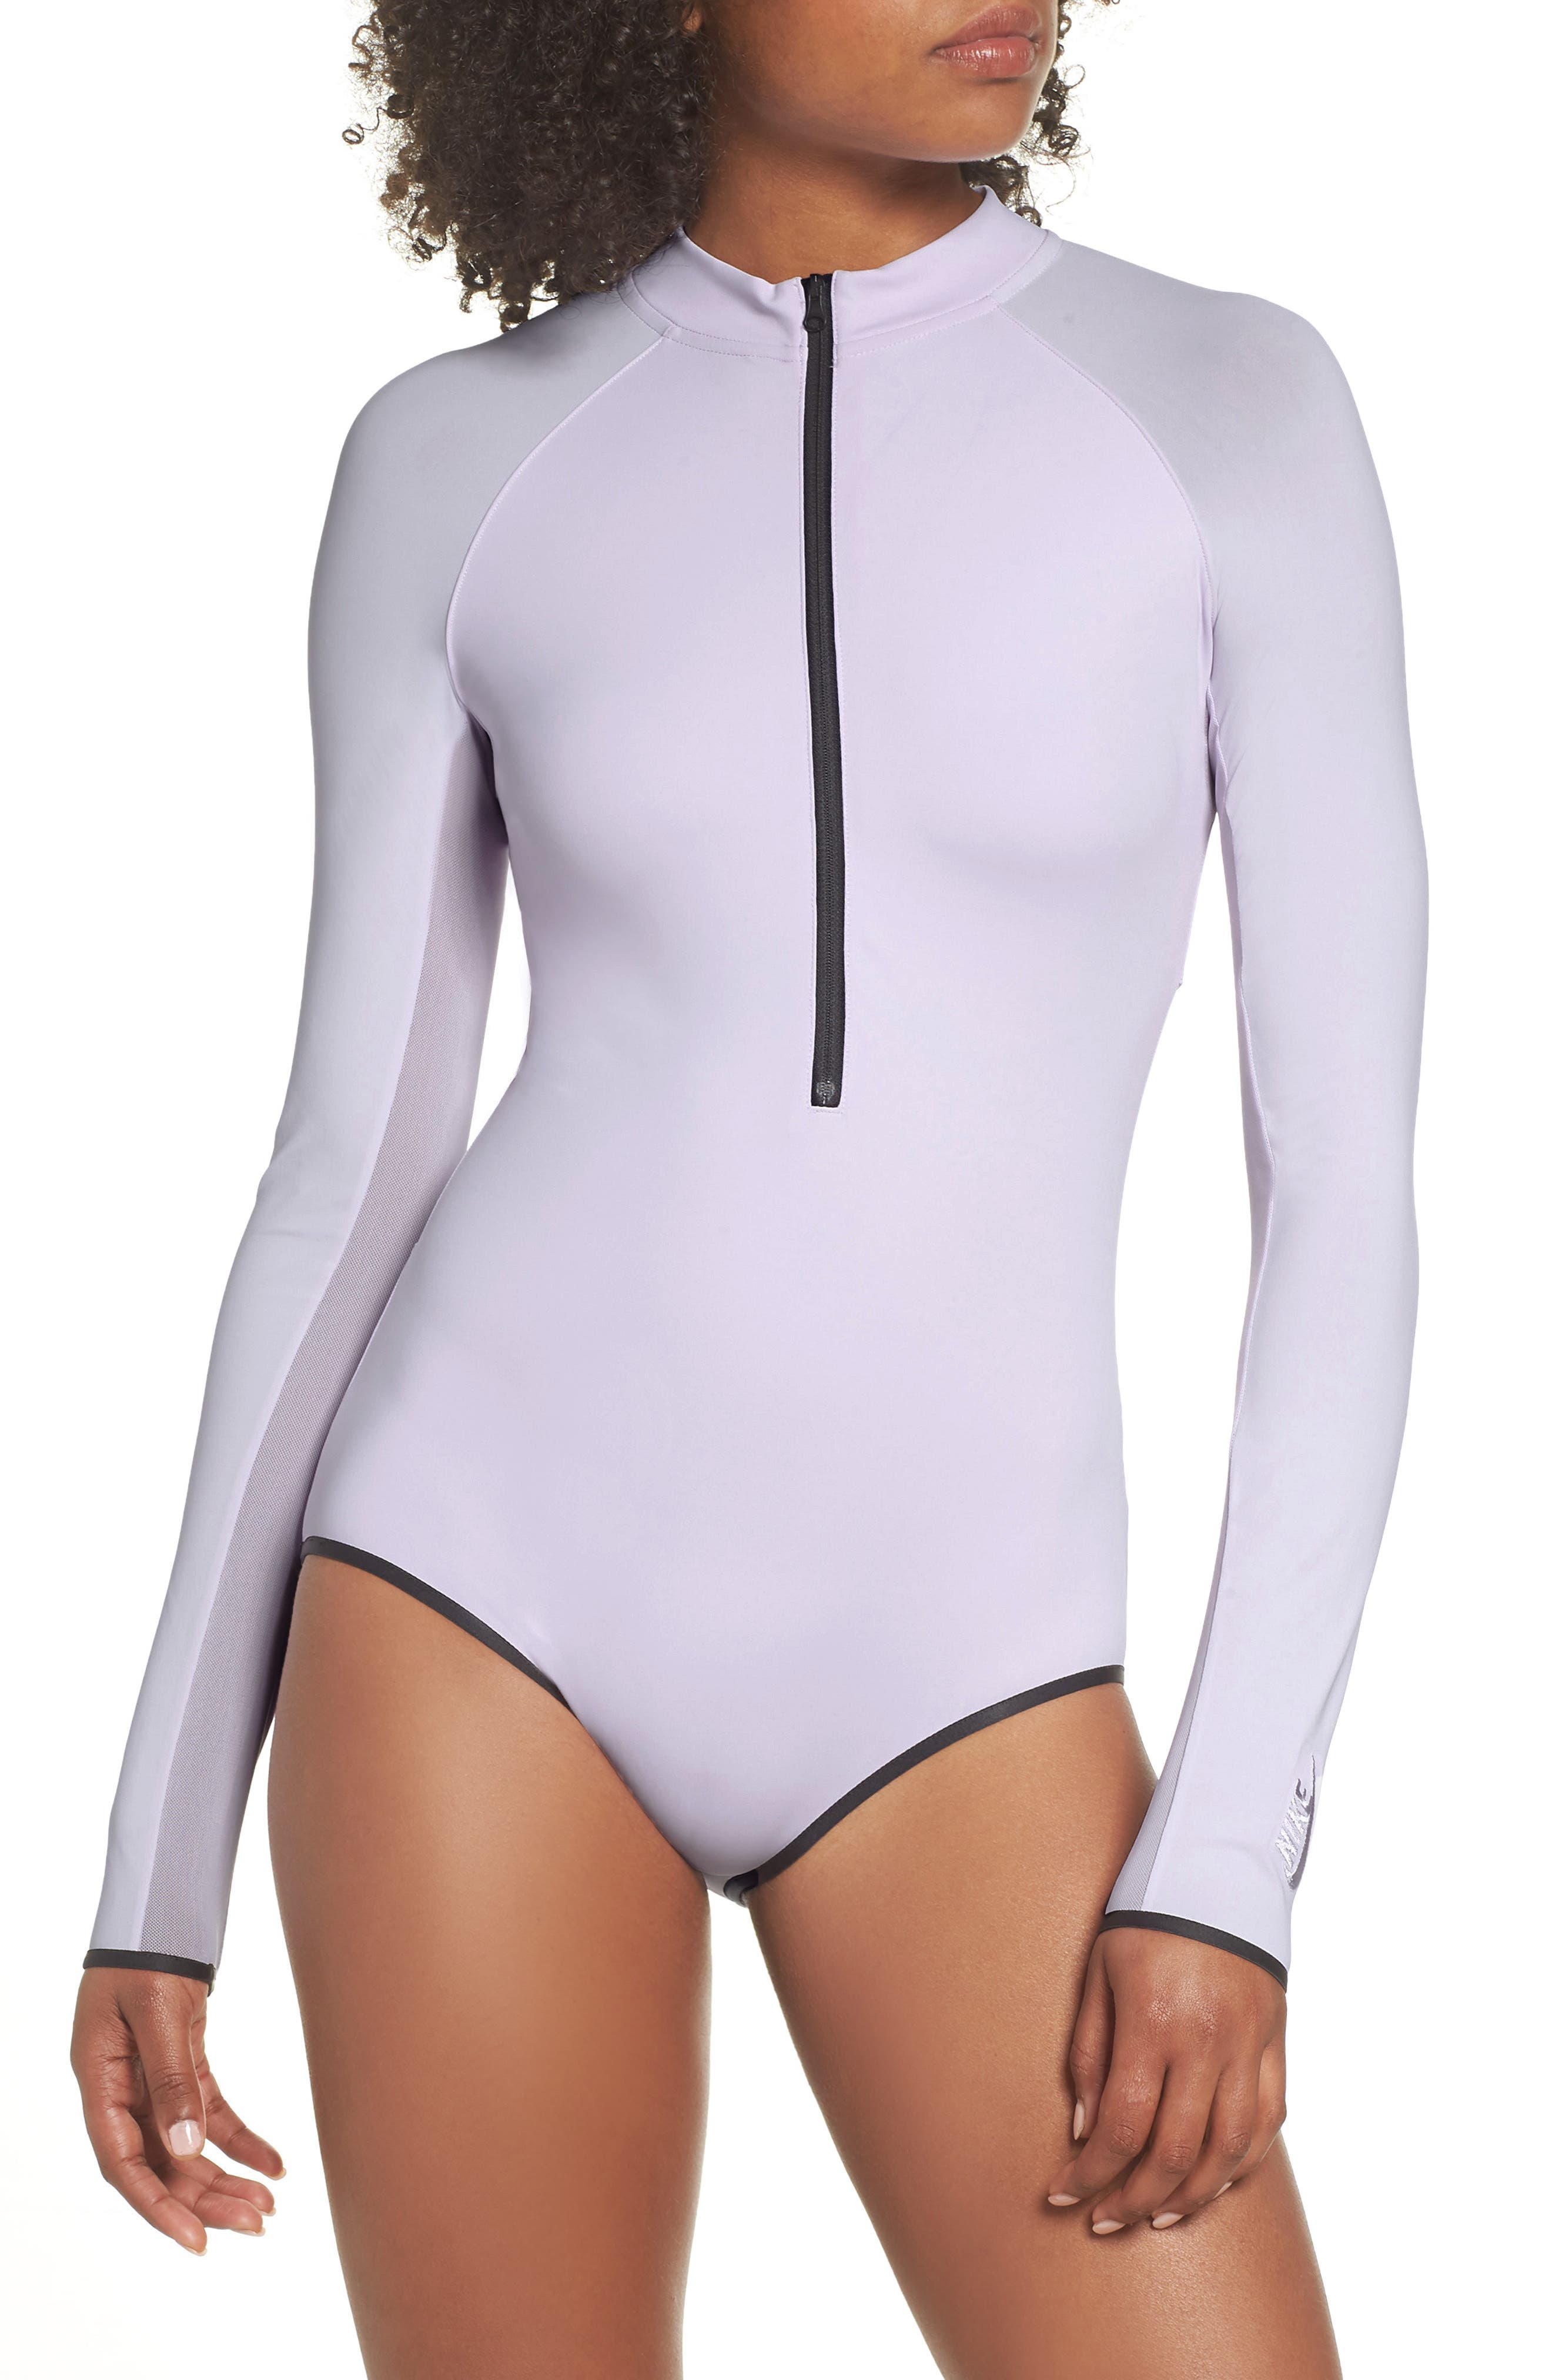 NRG Women's Dri-FIT Long Sleeve Bodysuit,                         Main,                         color, 509